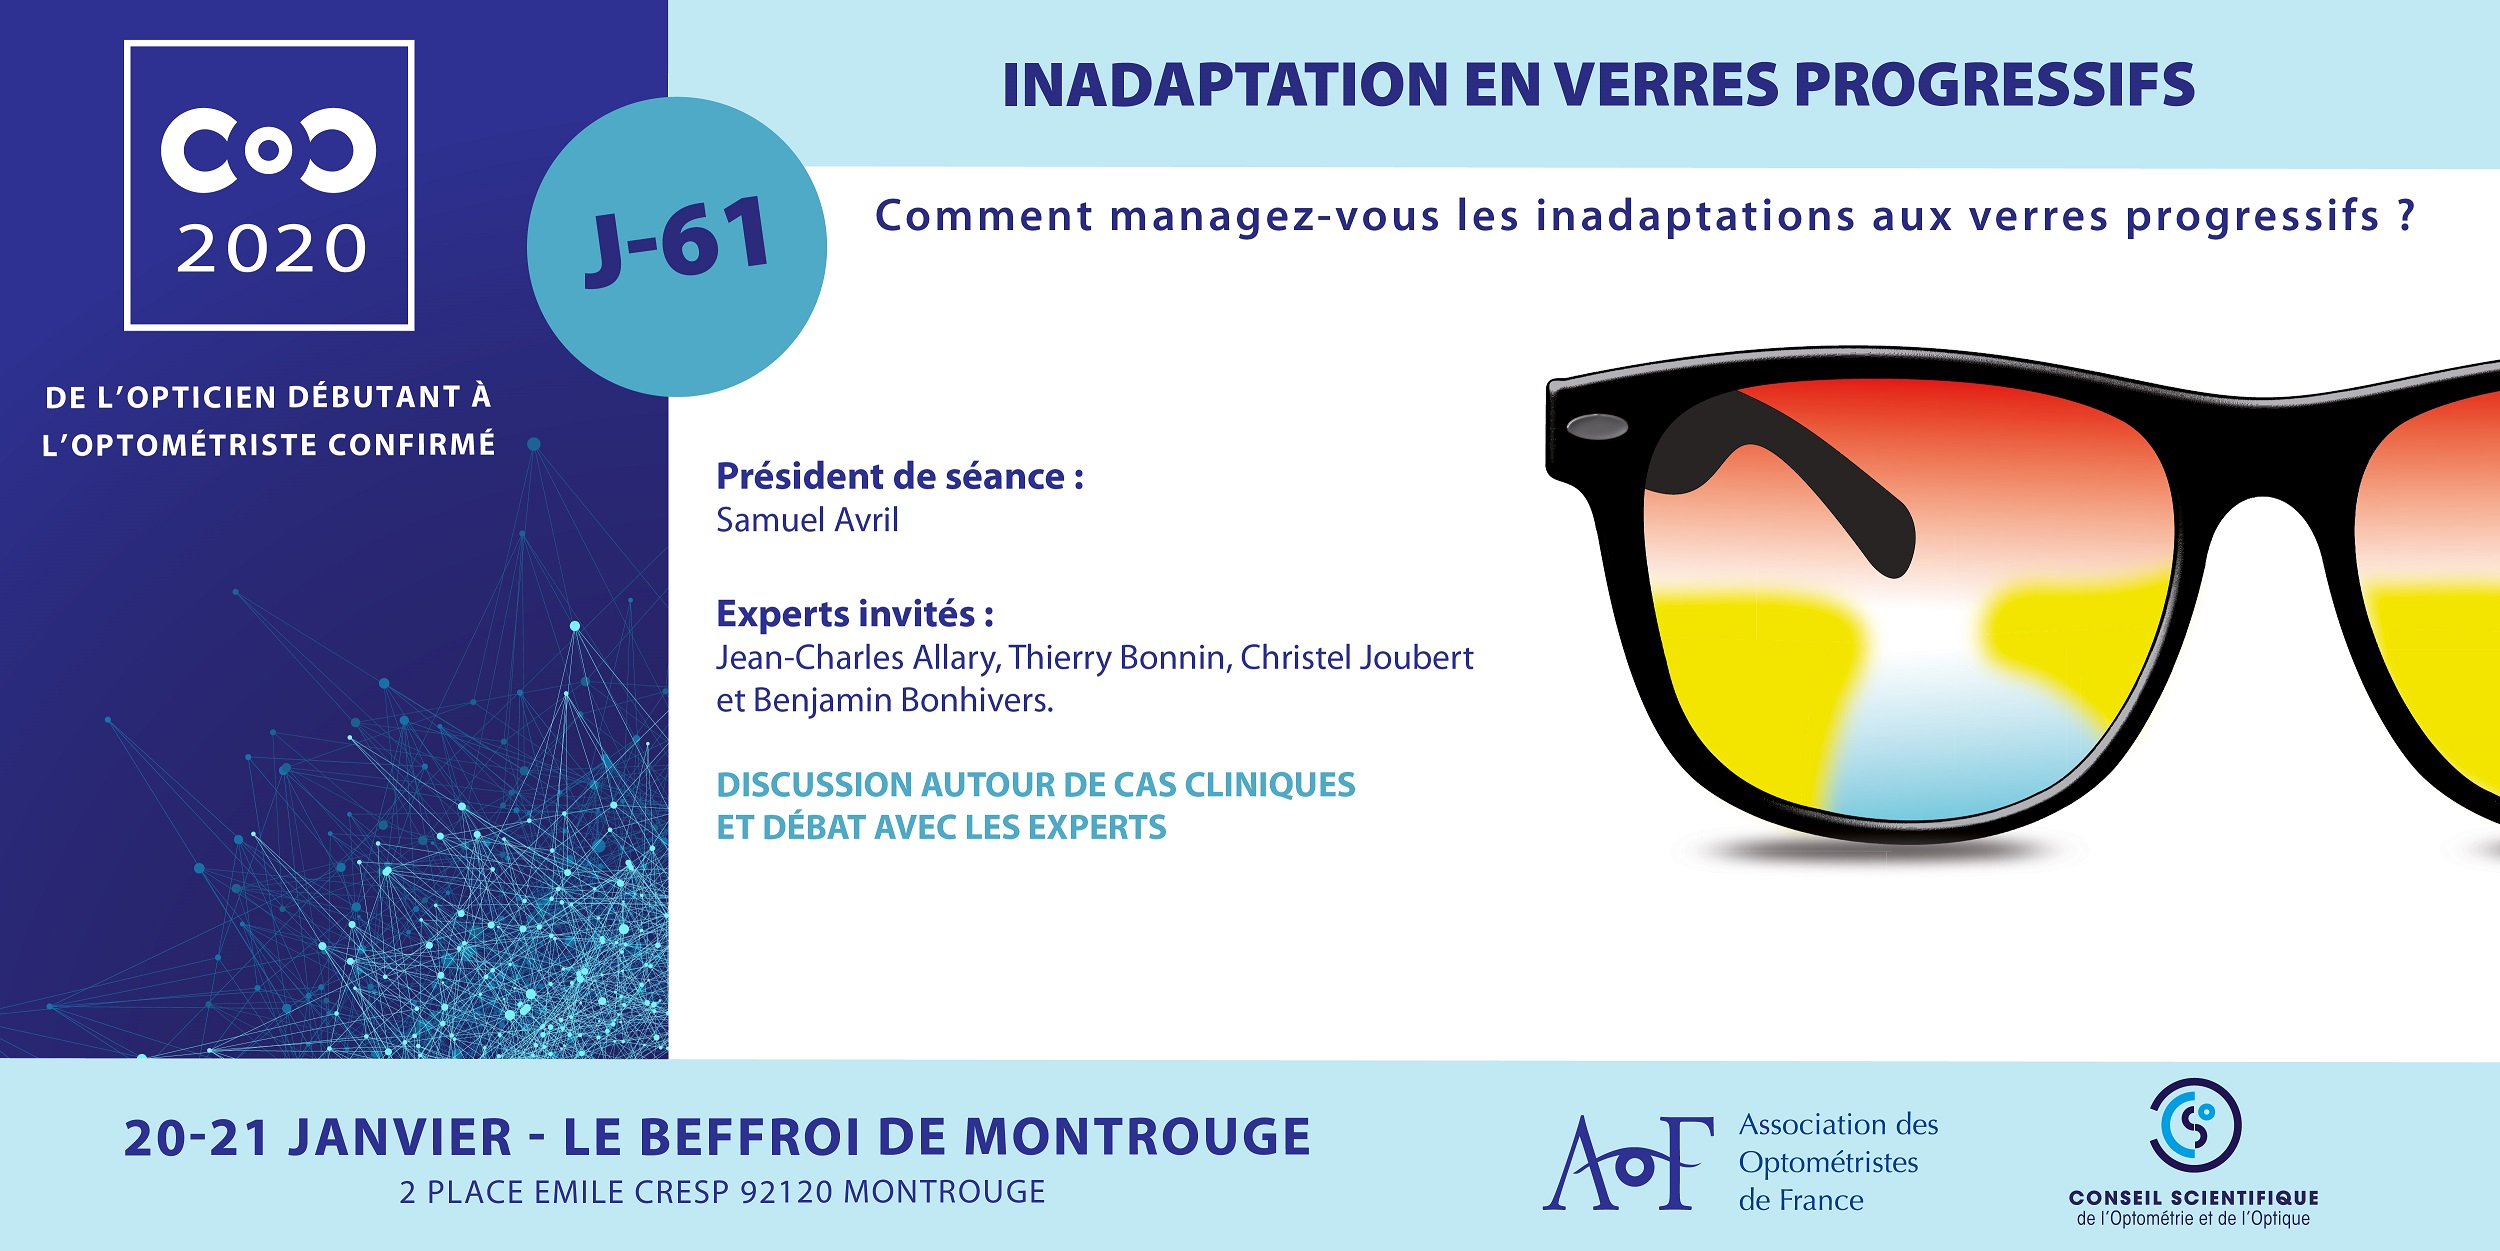 C.O.C.2020 / J-61 Inadaptation en verres progressifs